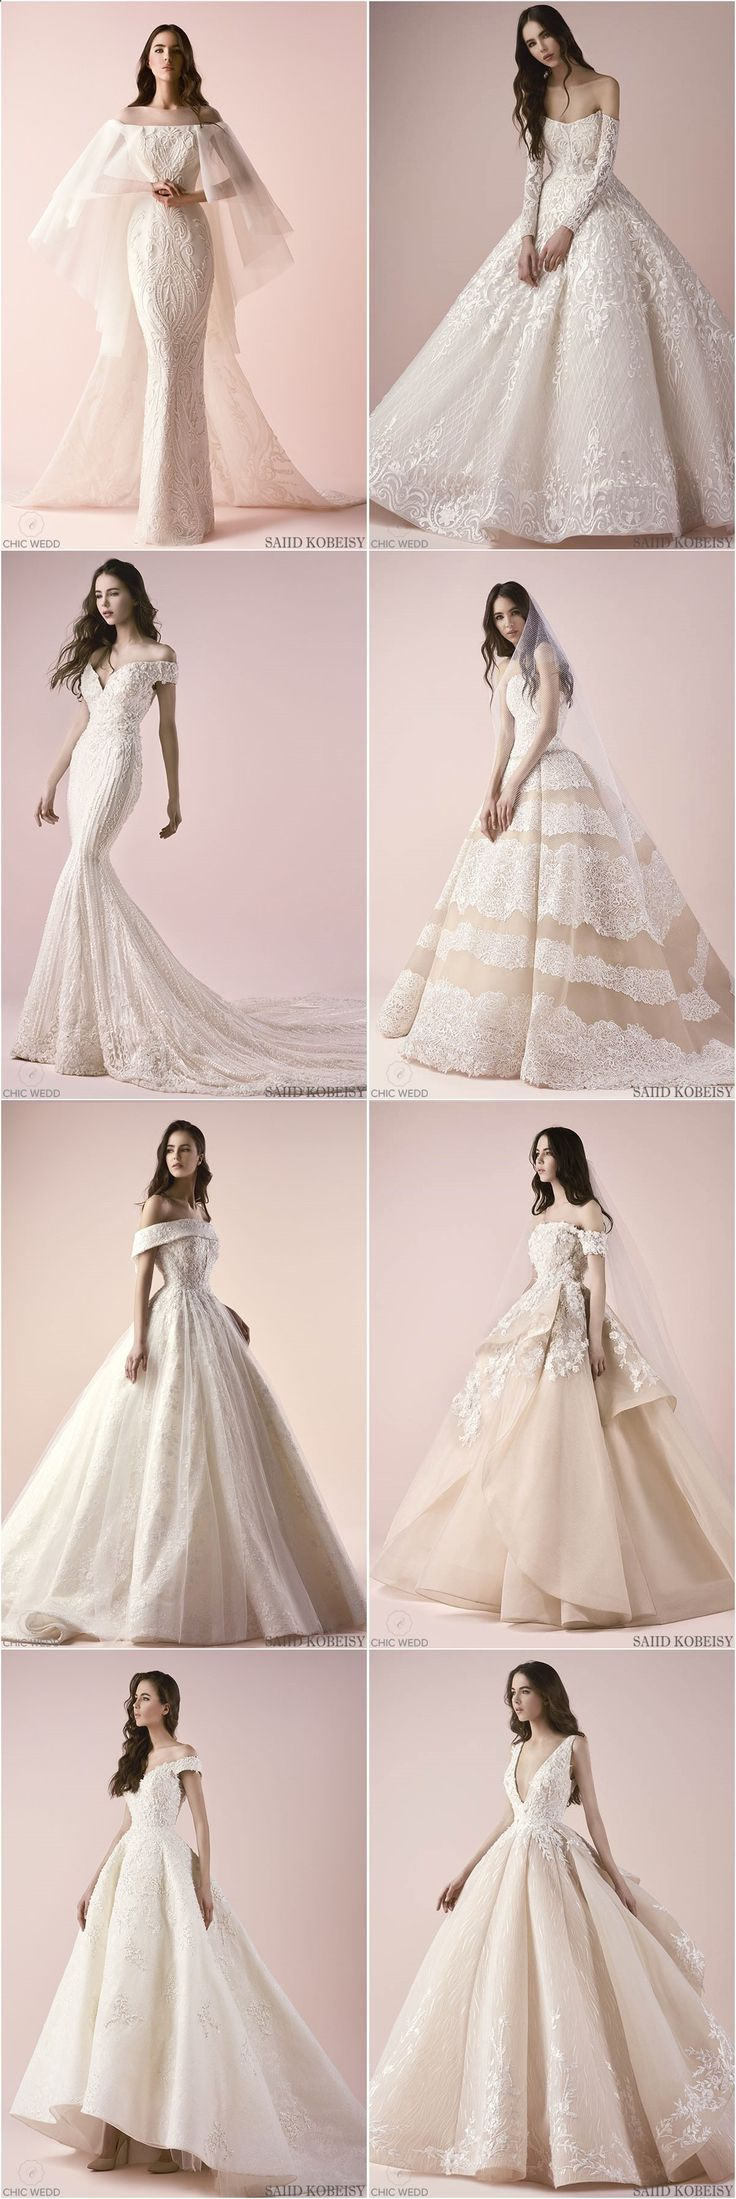 Saiid Kobeisy 2018 Wedding Dress Collection – #Collection #dress #girl #Kobeisy …